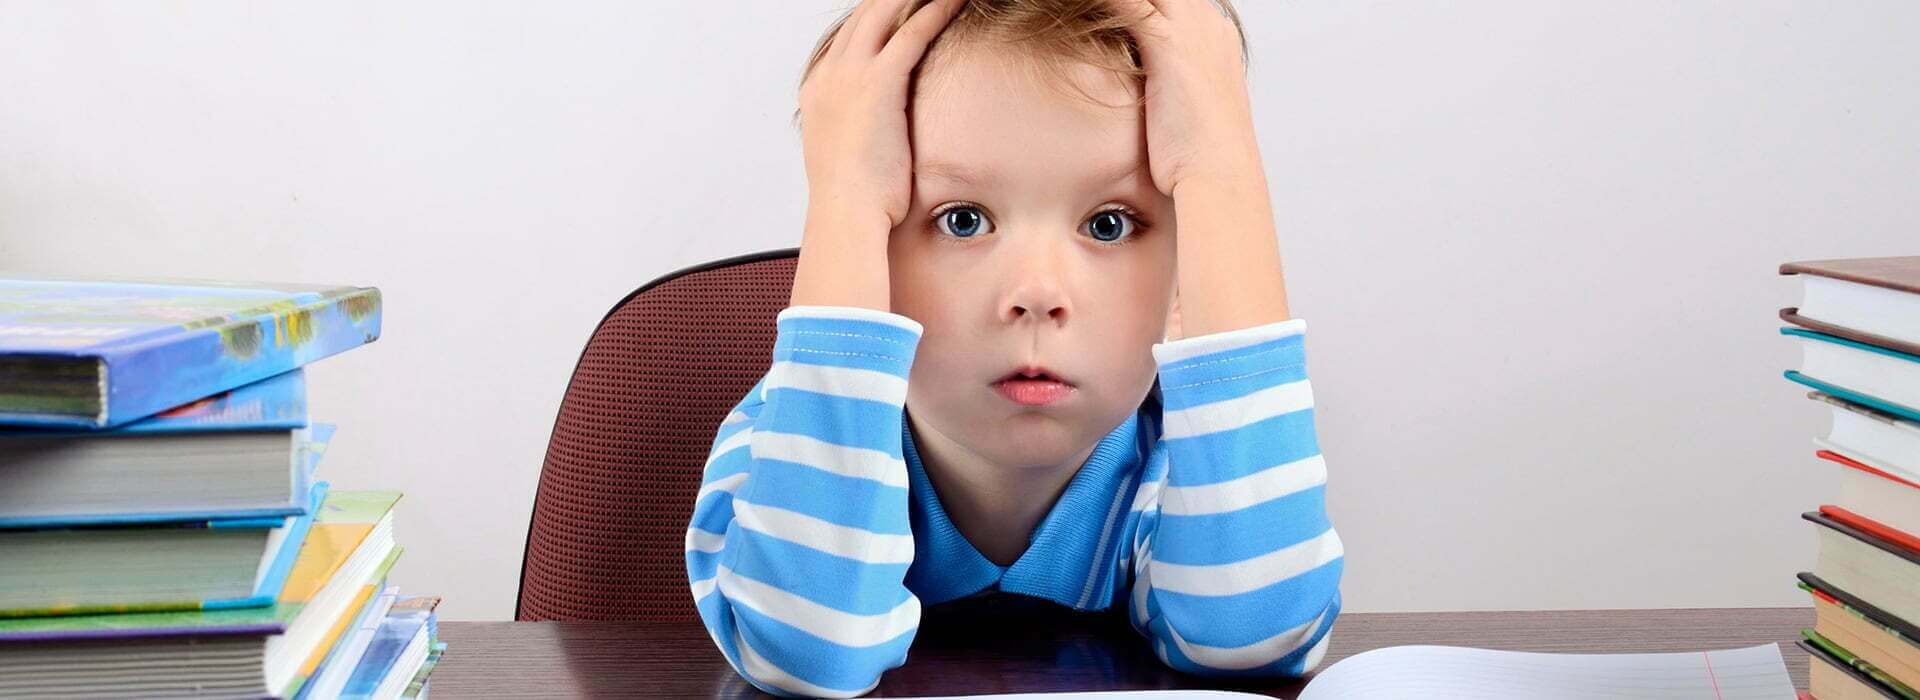 Dikkat eksikligi ve disleksi